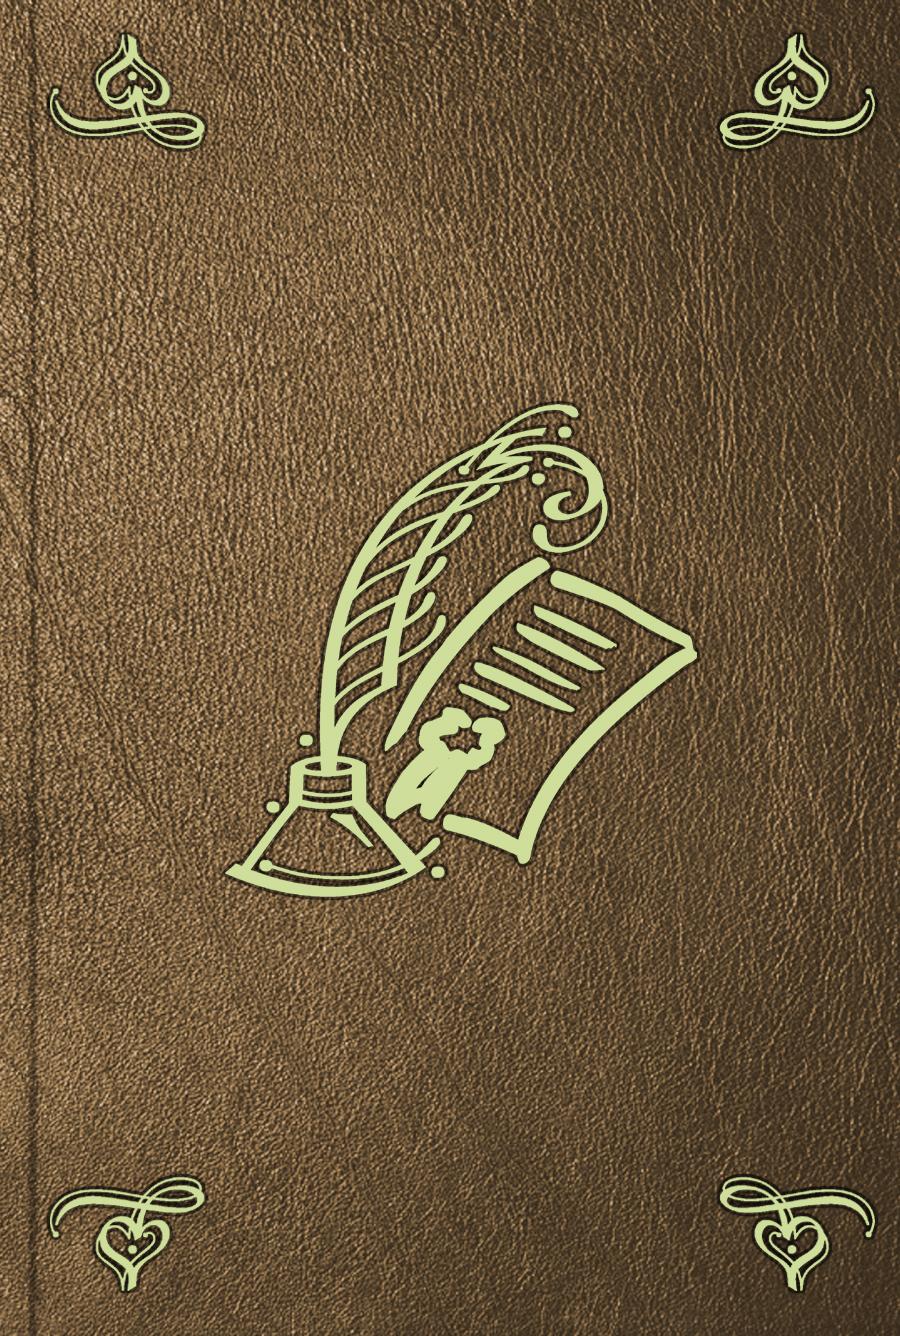 Arthur Collins The Peerage of England. Vol. 6 henry fritz gilbert genealogical gleanings in england waters the new england historical and genealogical register 1877